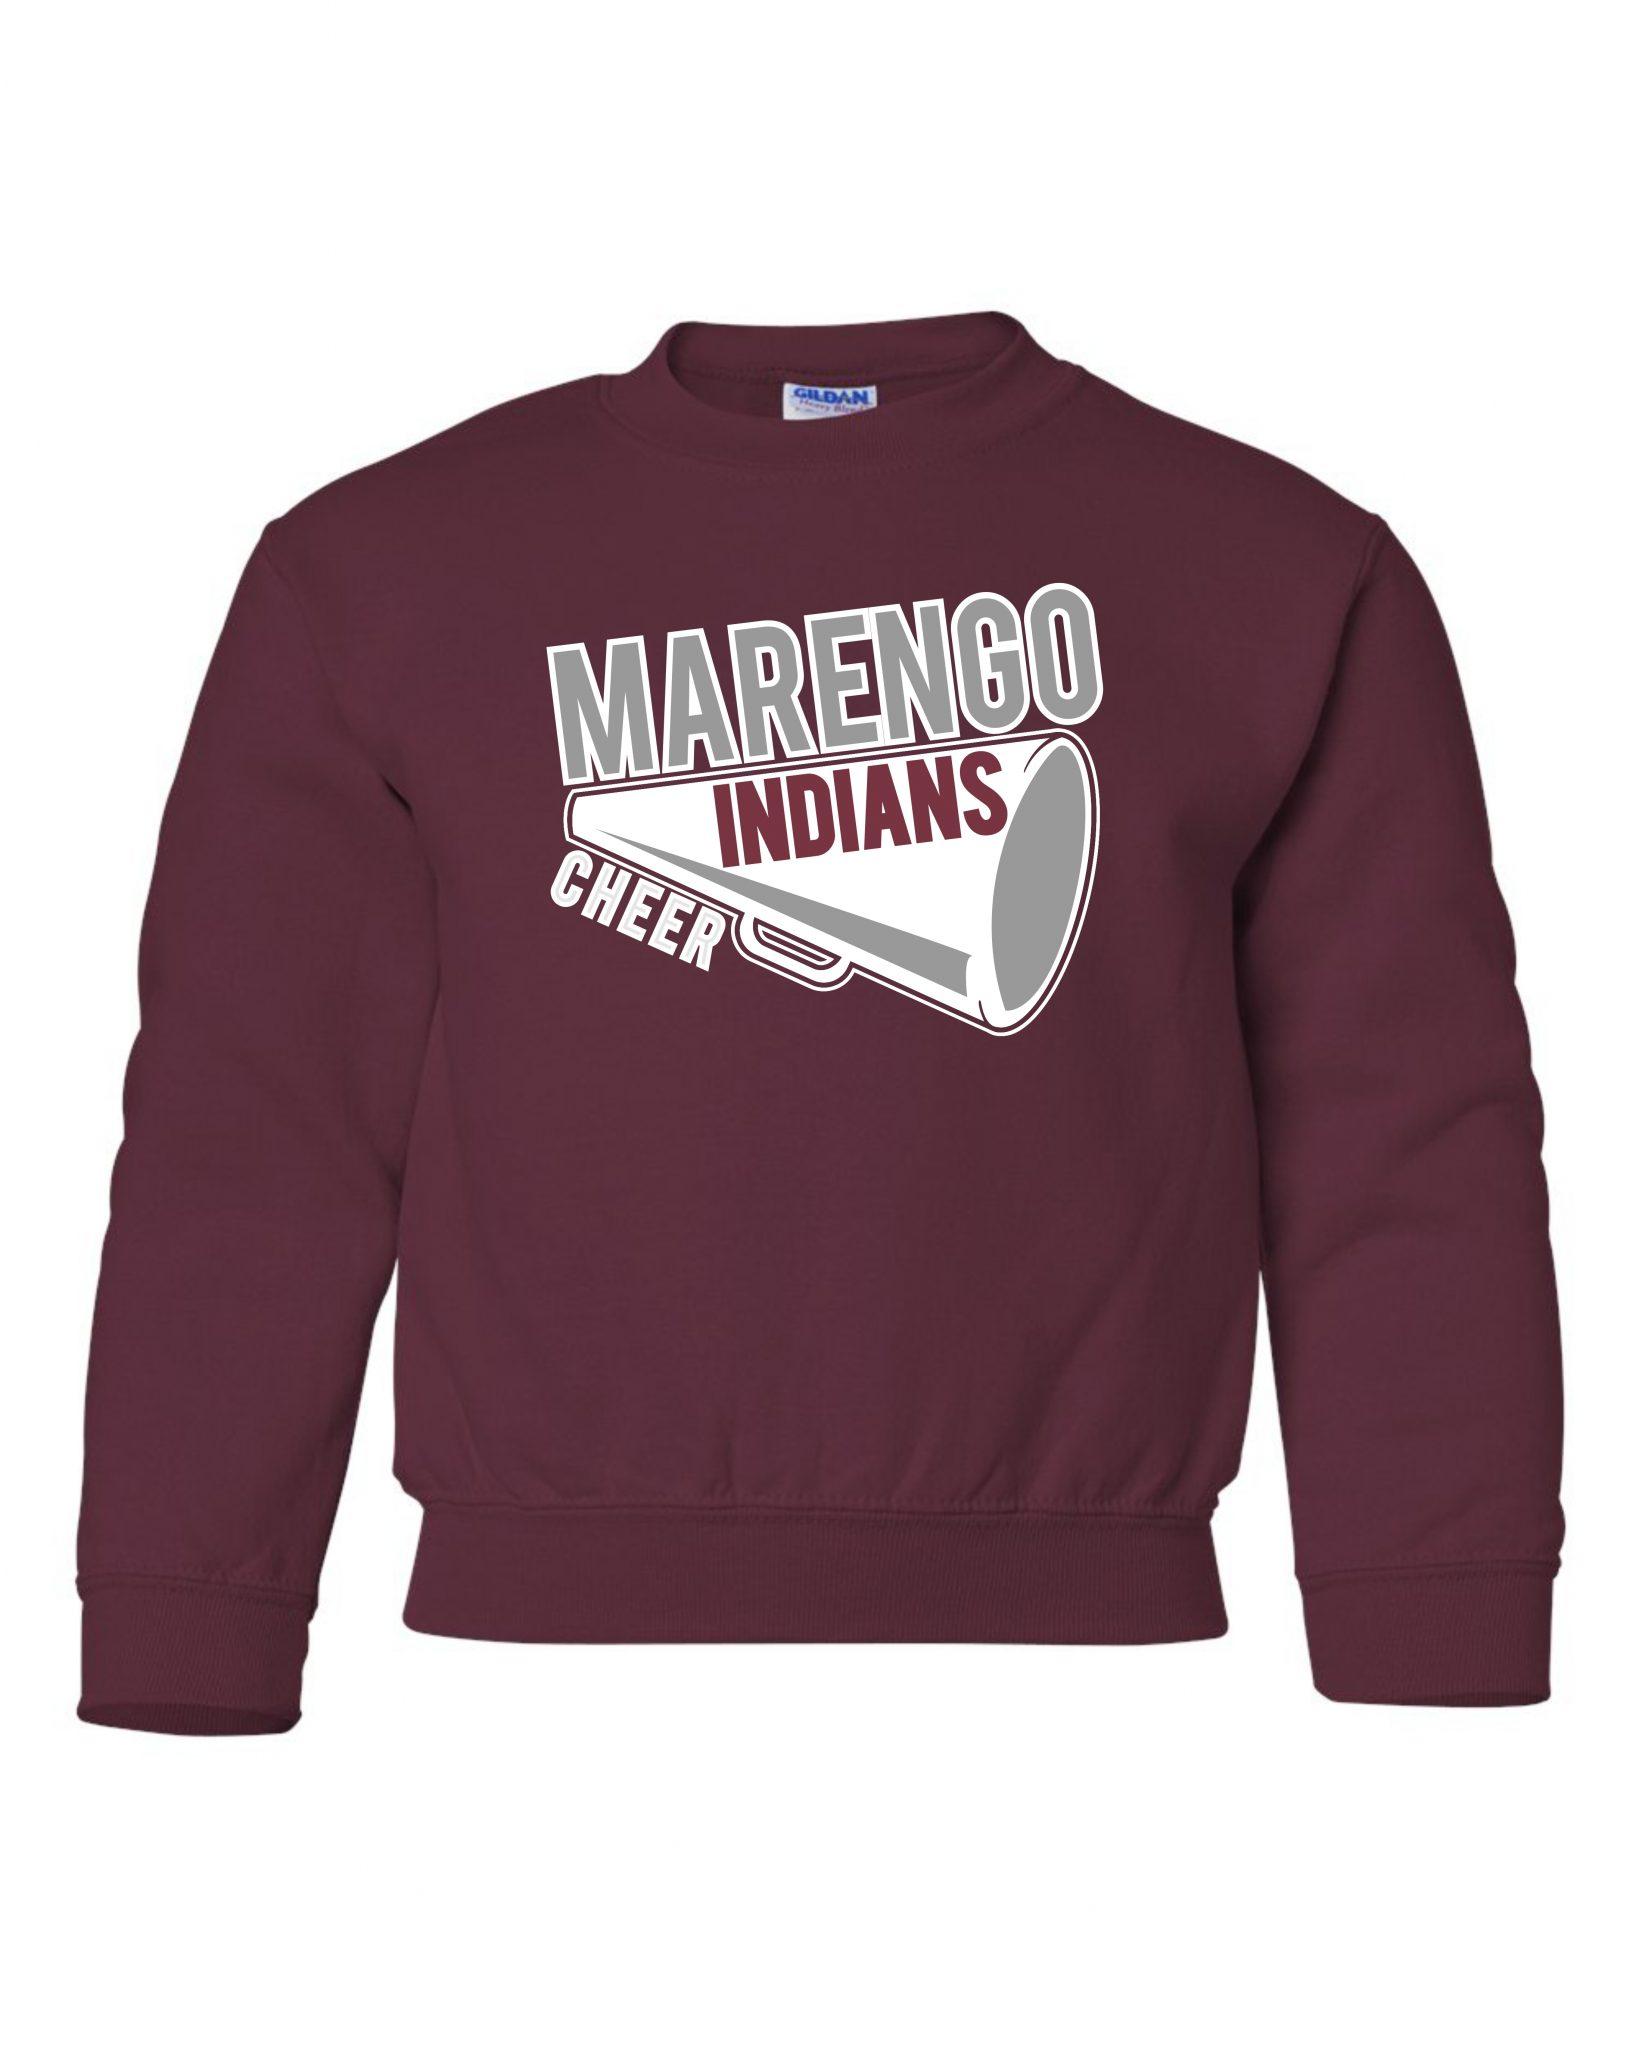 Cheerleading Sweatshirt